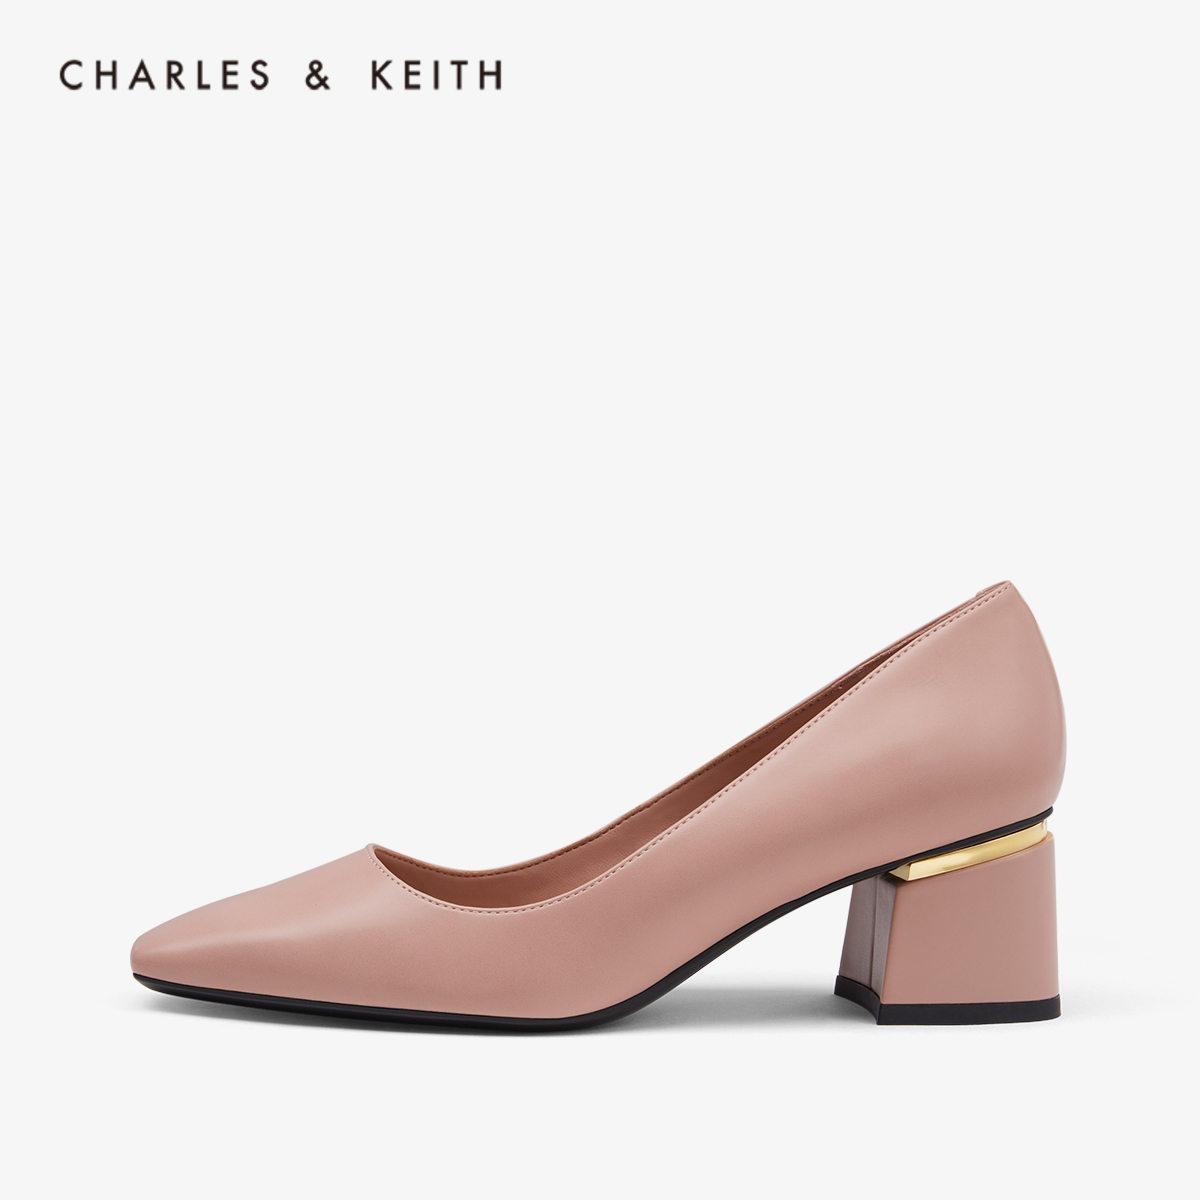 CHARLES&KEITH秋冬女鞋CK1-60280198女士方头高跟鞋粗跟单鞋